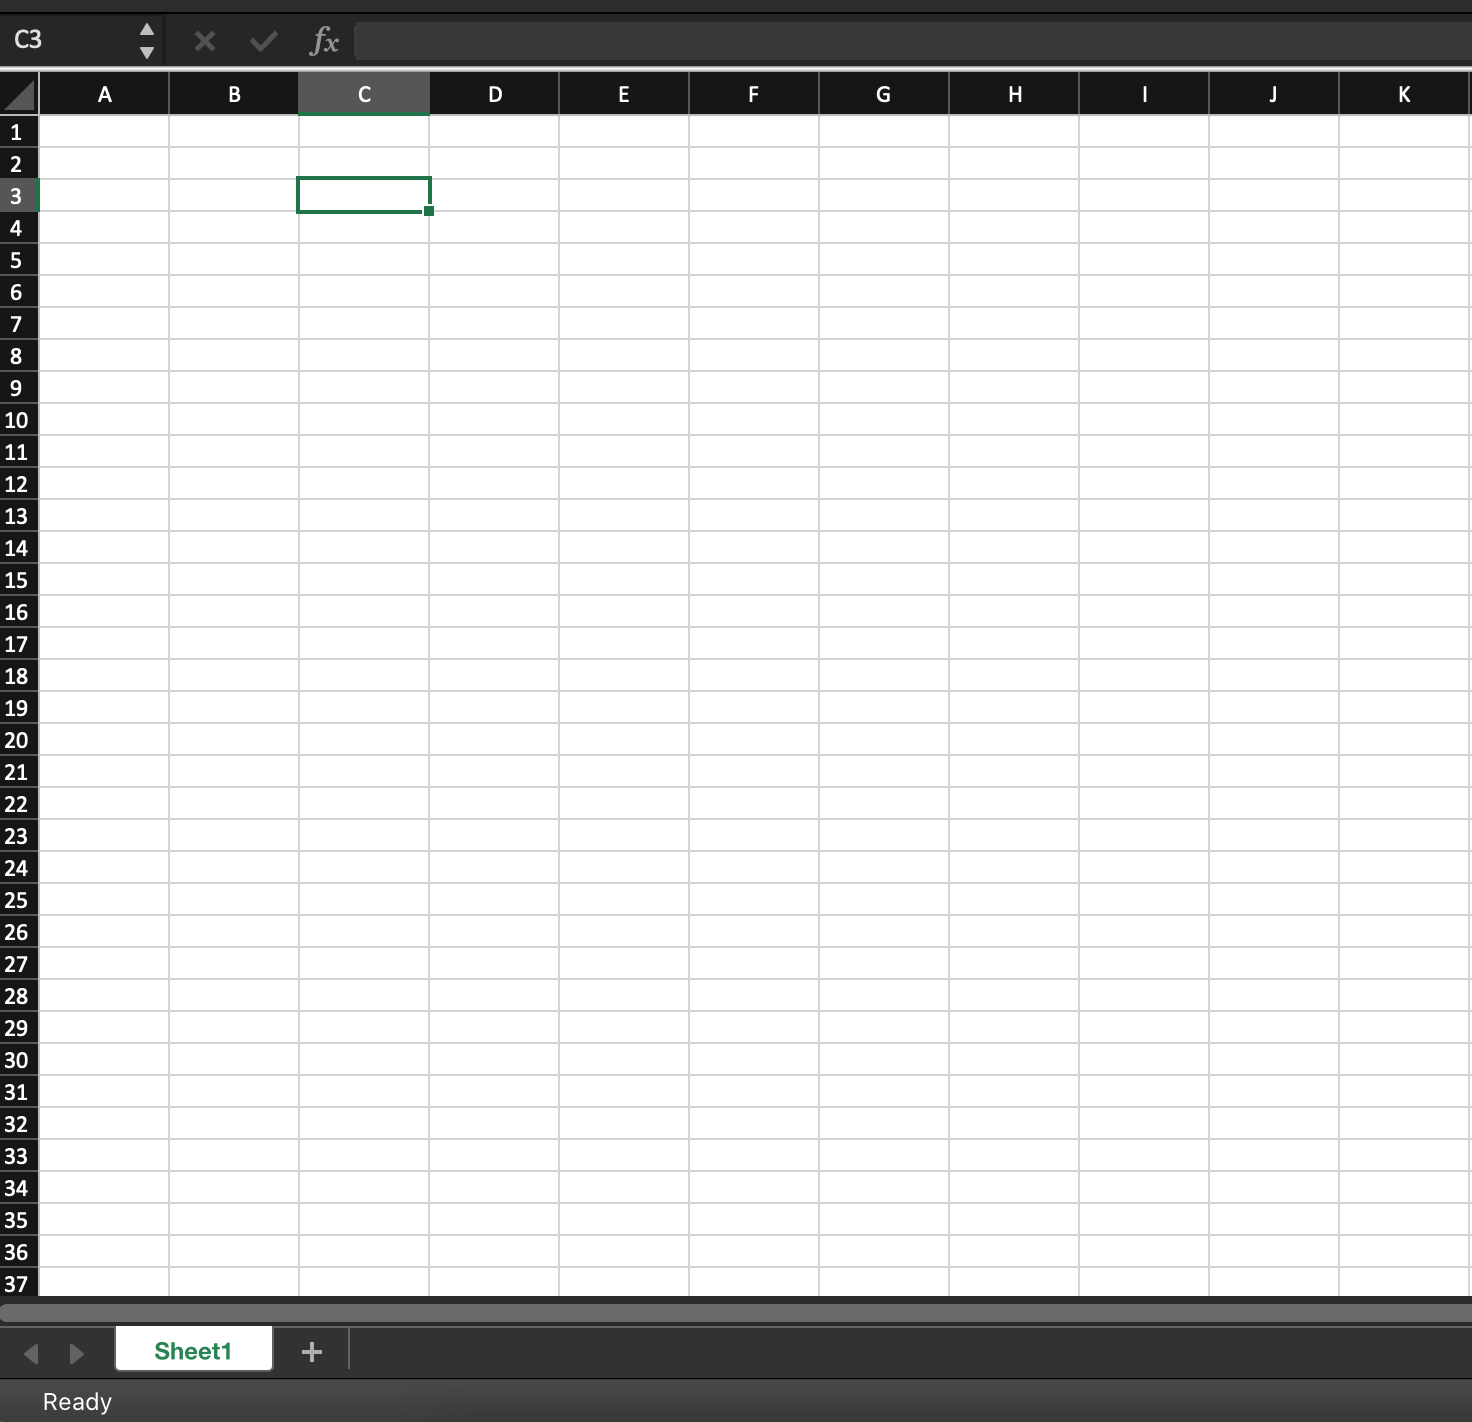 Screenshot-2021-08-06-at-2.19.09-PM